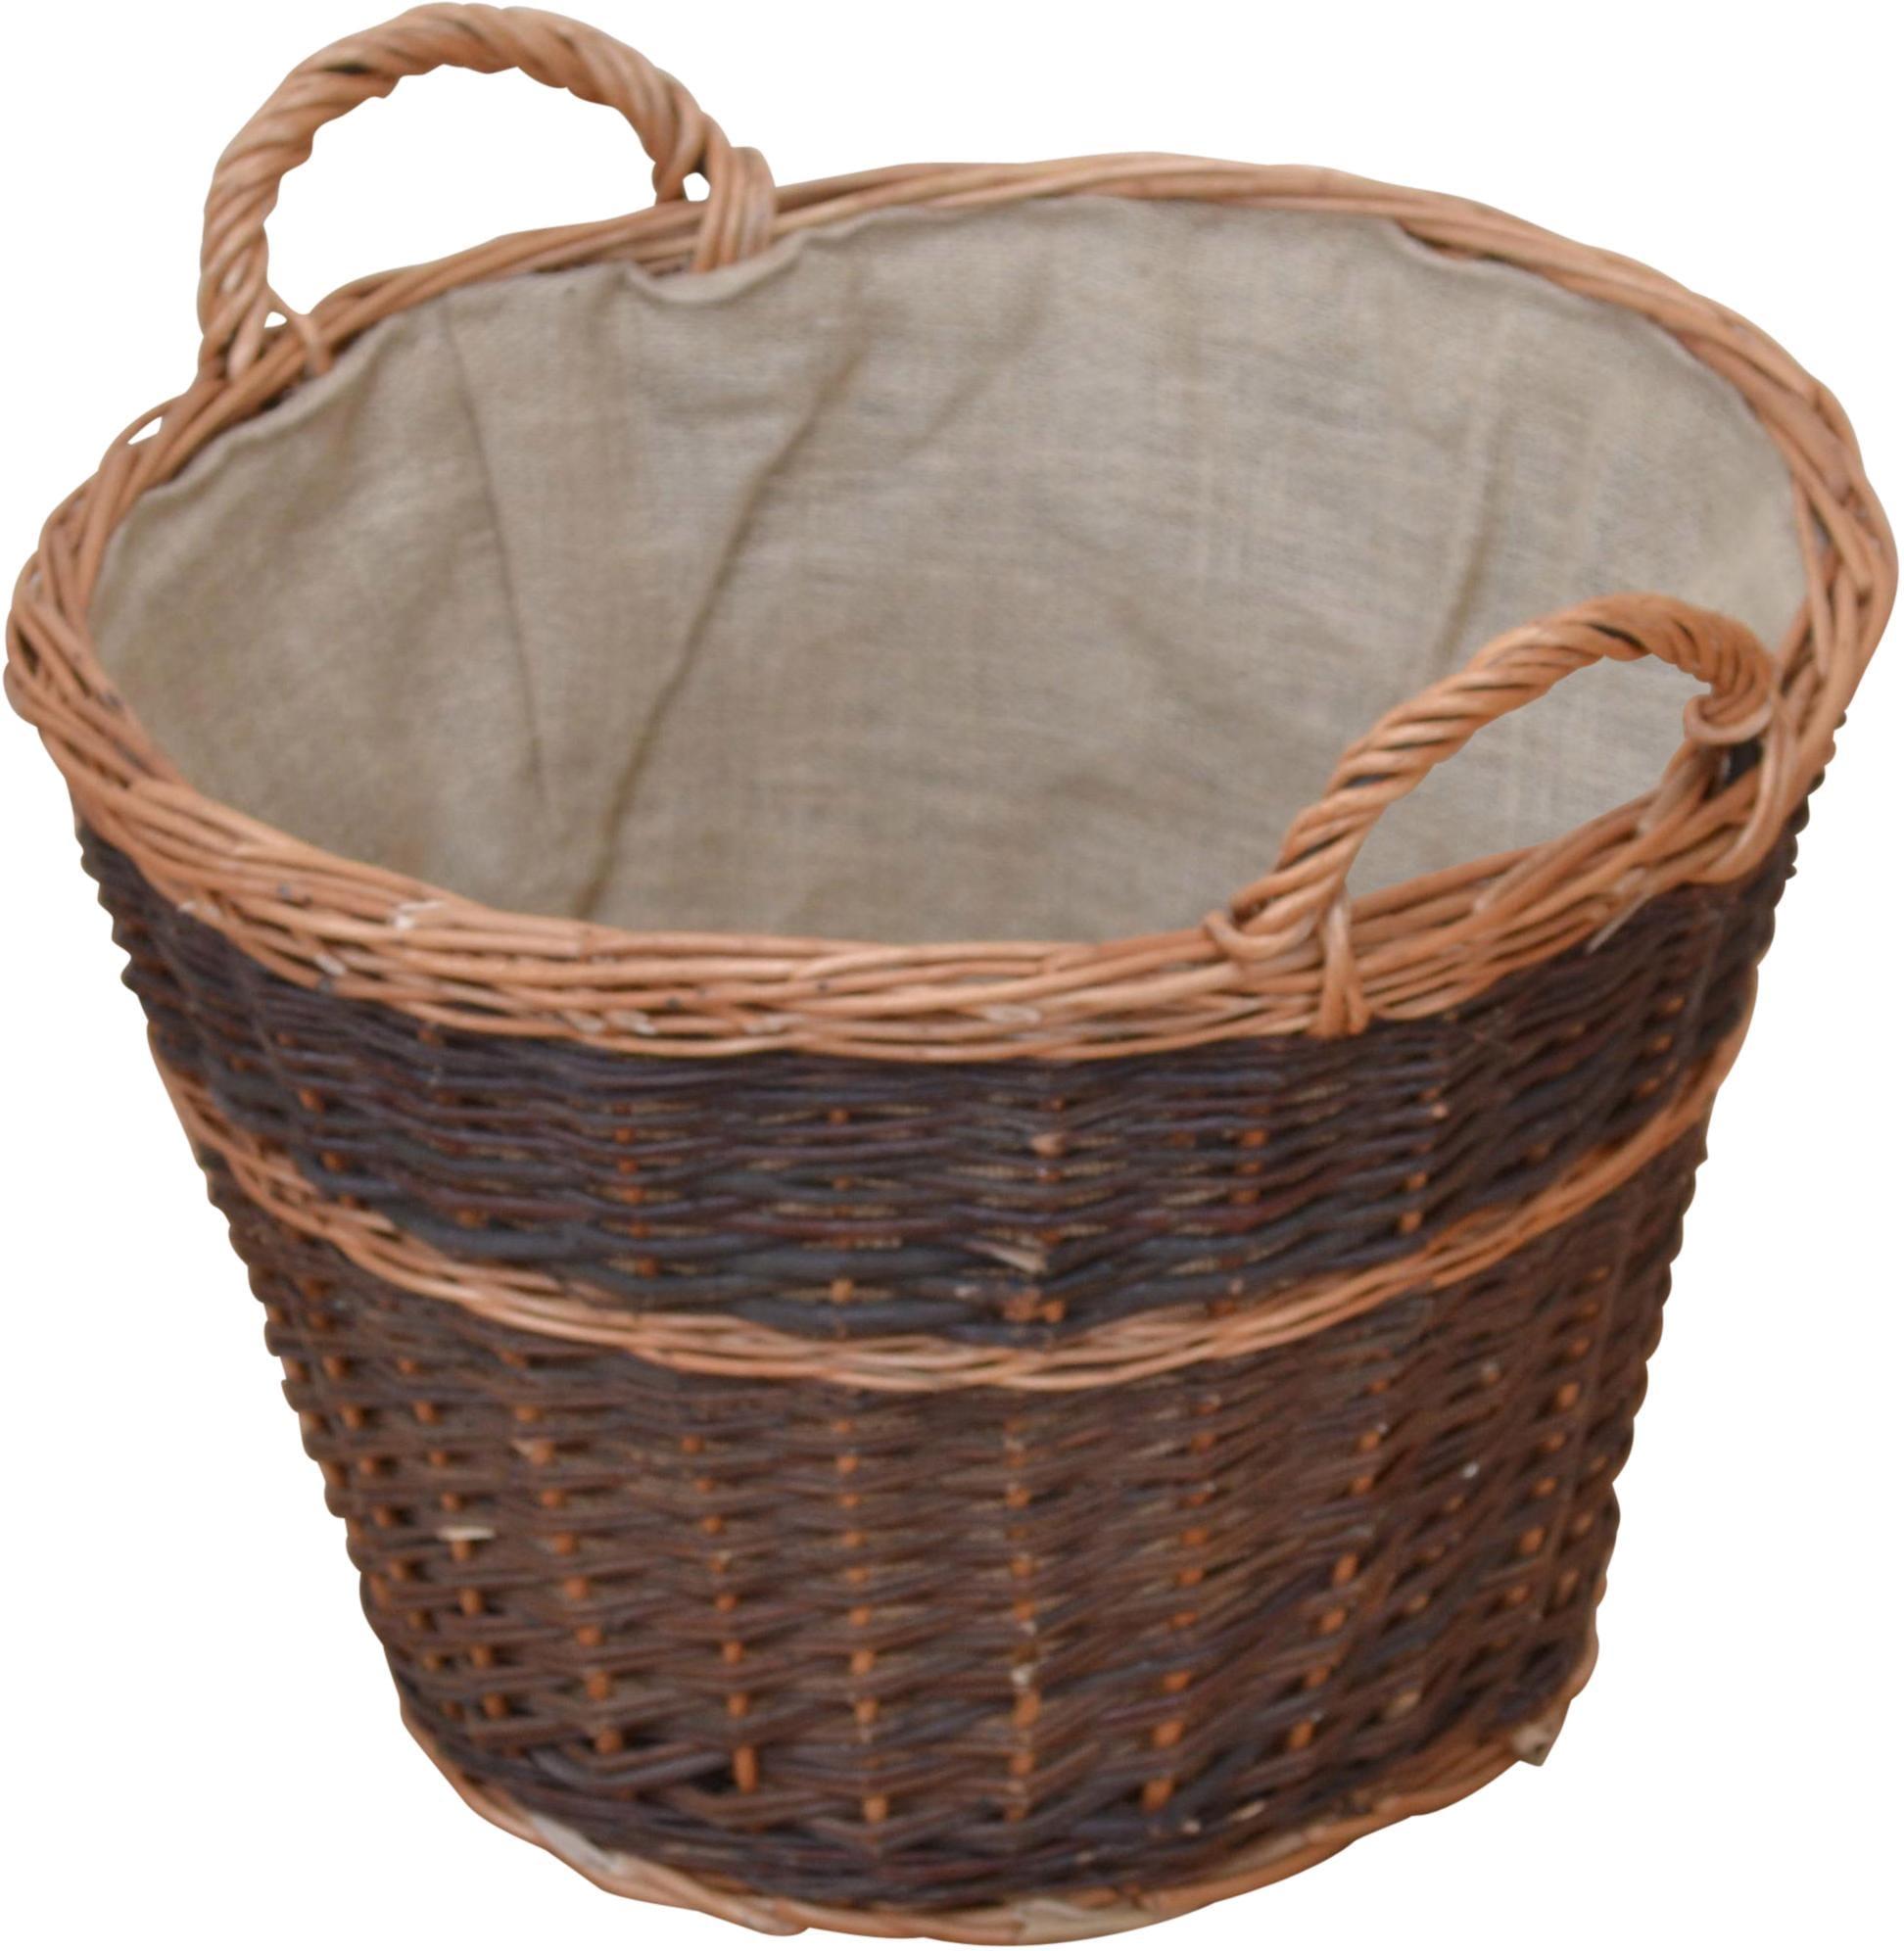 Kaminholzkorb, aus ungeschälter Vollweide braun Körbe Aufbewahrung Ordnung Wohnaccessoires Kaminholzkorb